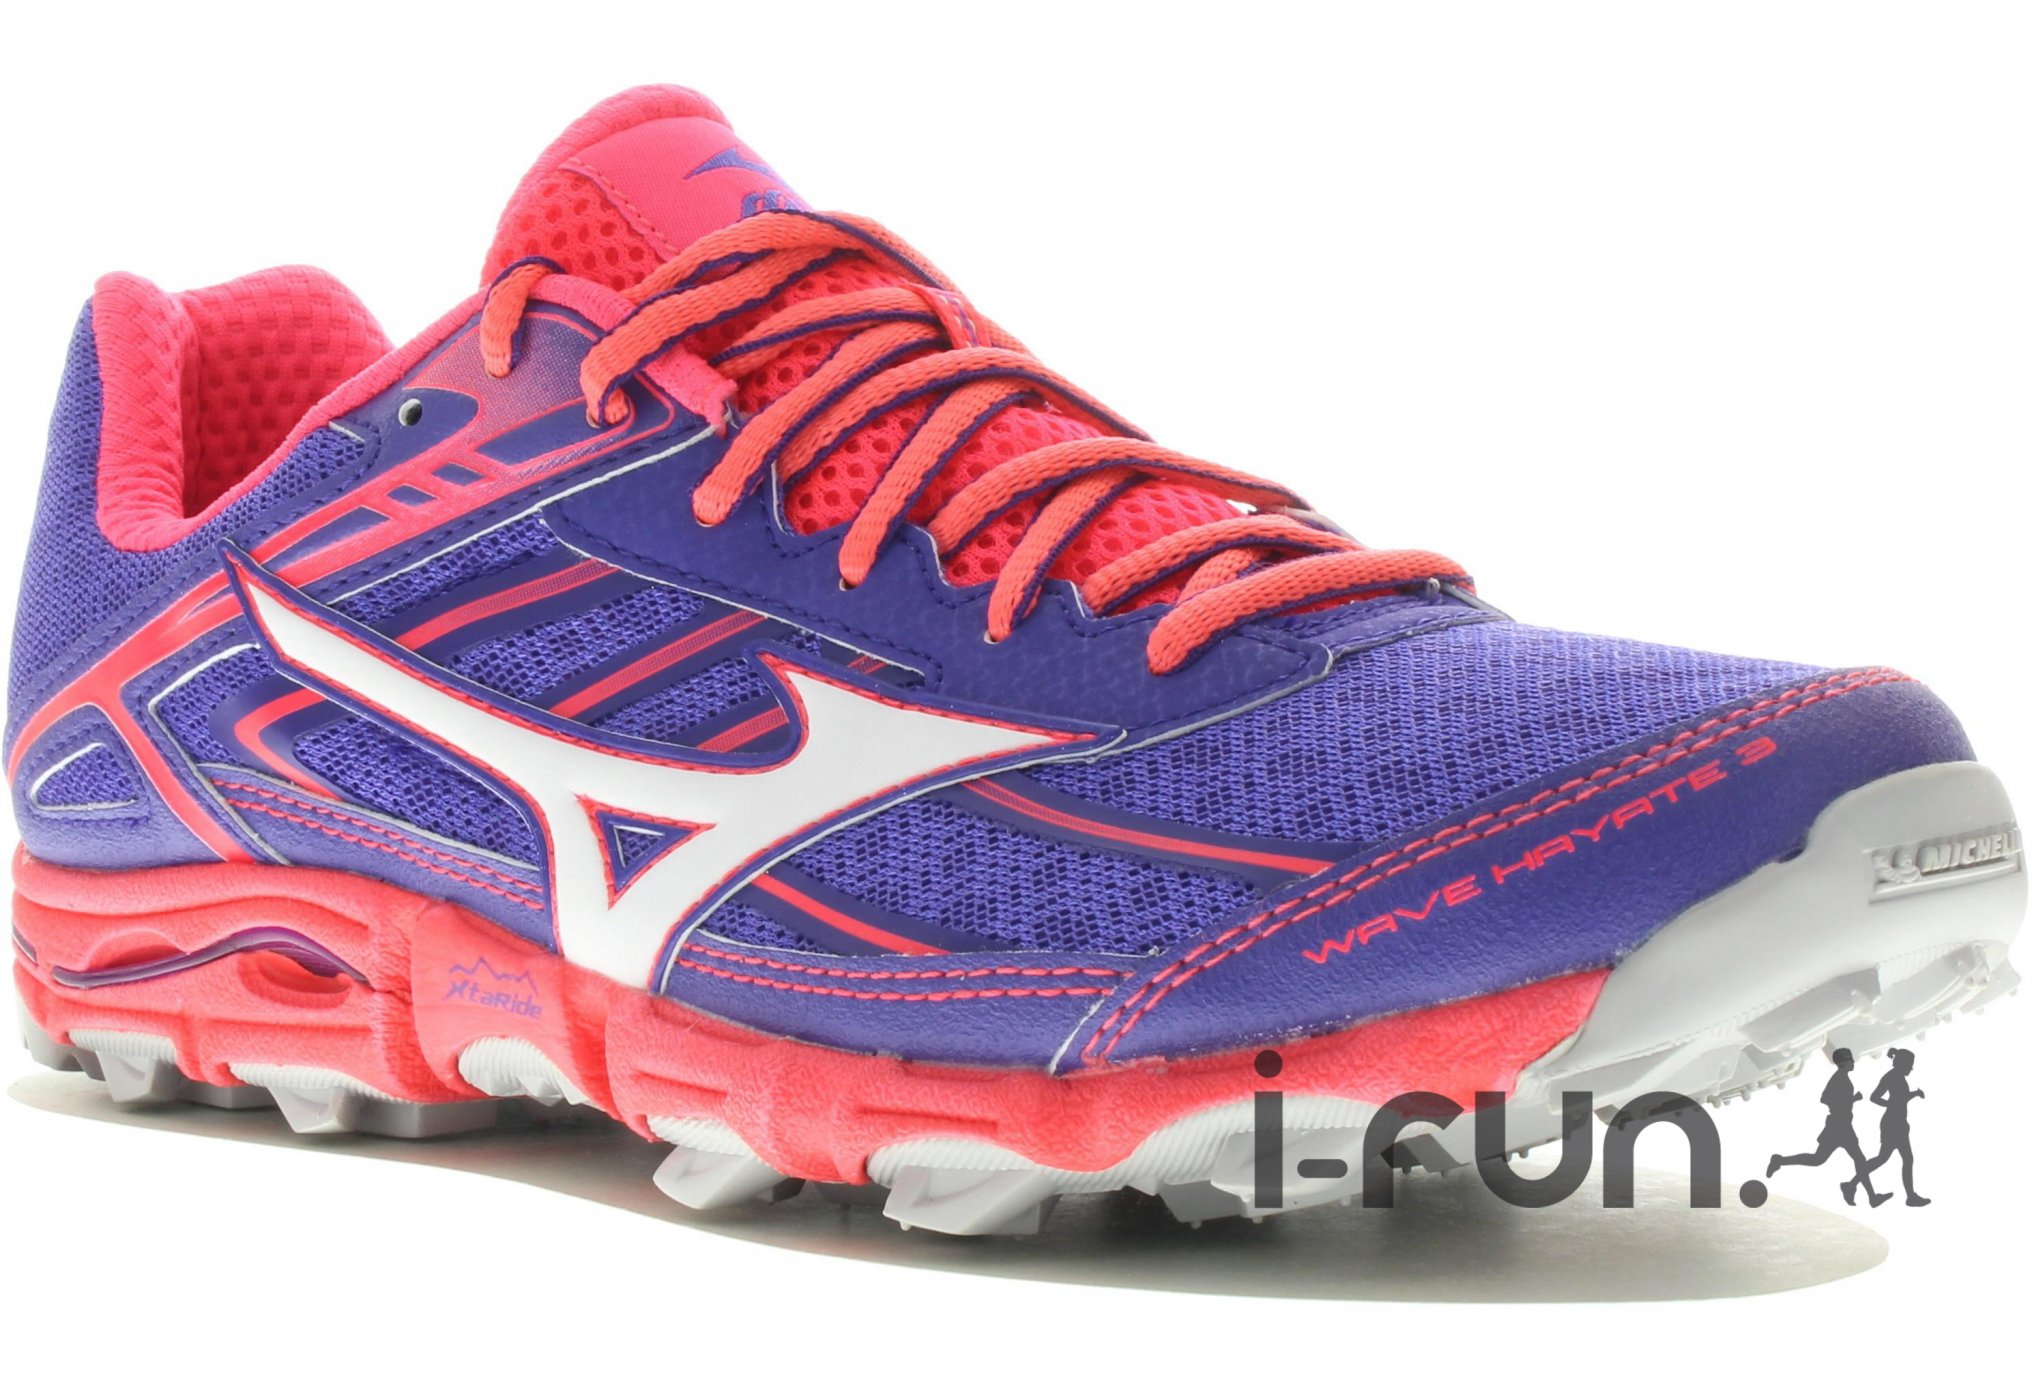 Mizuno Wave Hayate 3 W Chaussures running femme